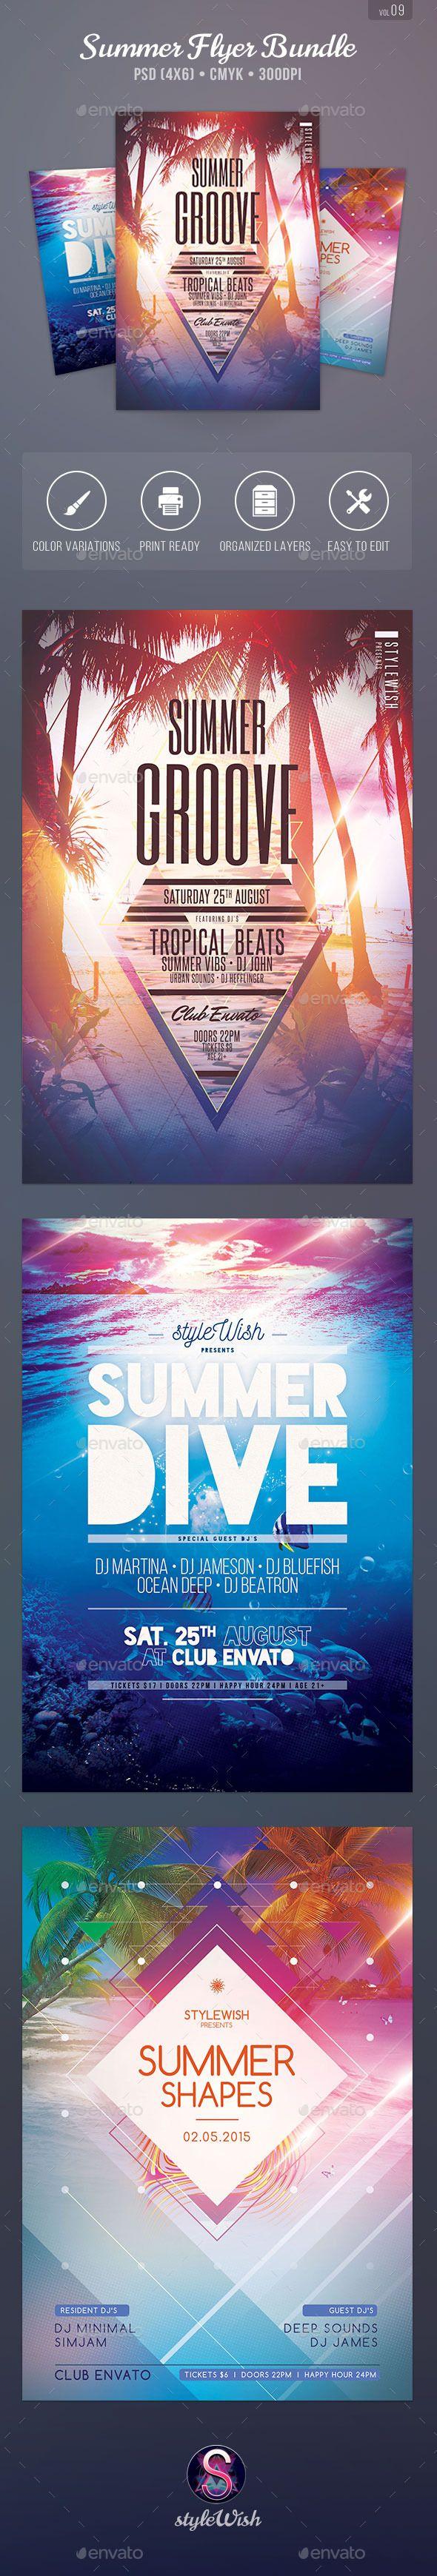 Poster design firms - 537 Best Poster Design Images On Pinterest Flyer Design Poster And Flyer Template